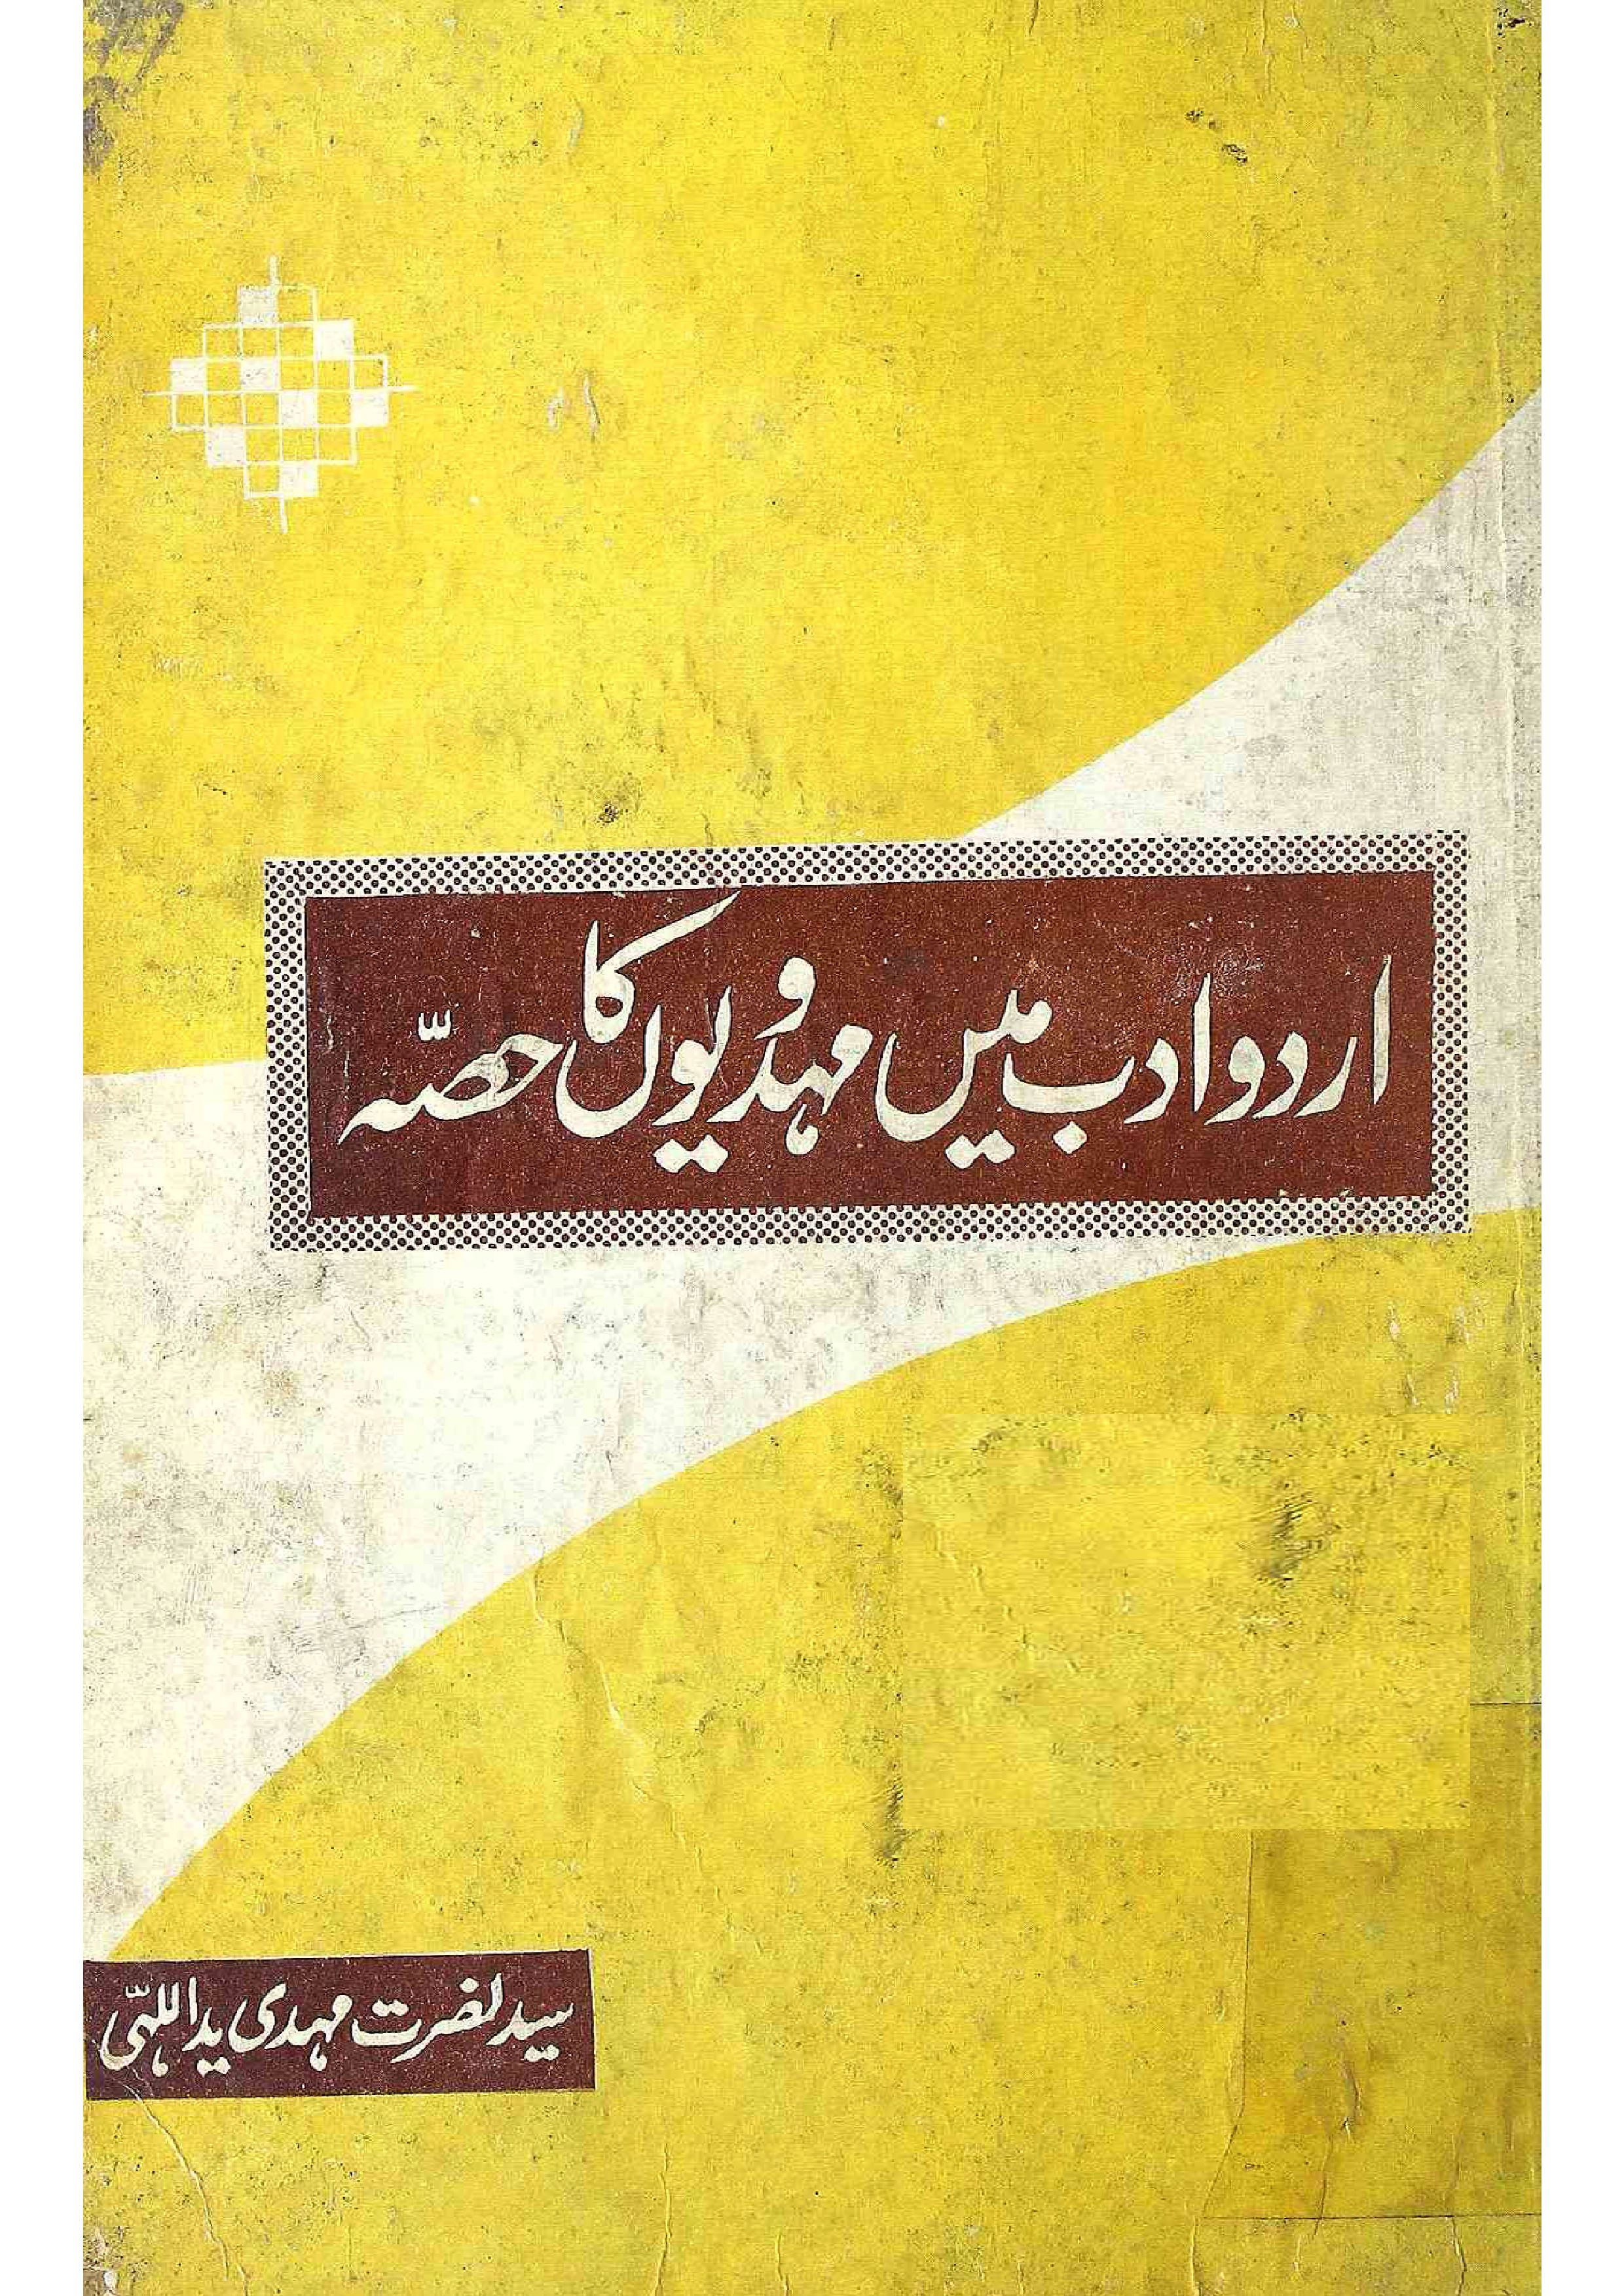 Urdu Adab Mein Mahdaviyon Ka Hissa     1984